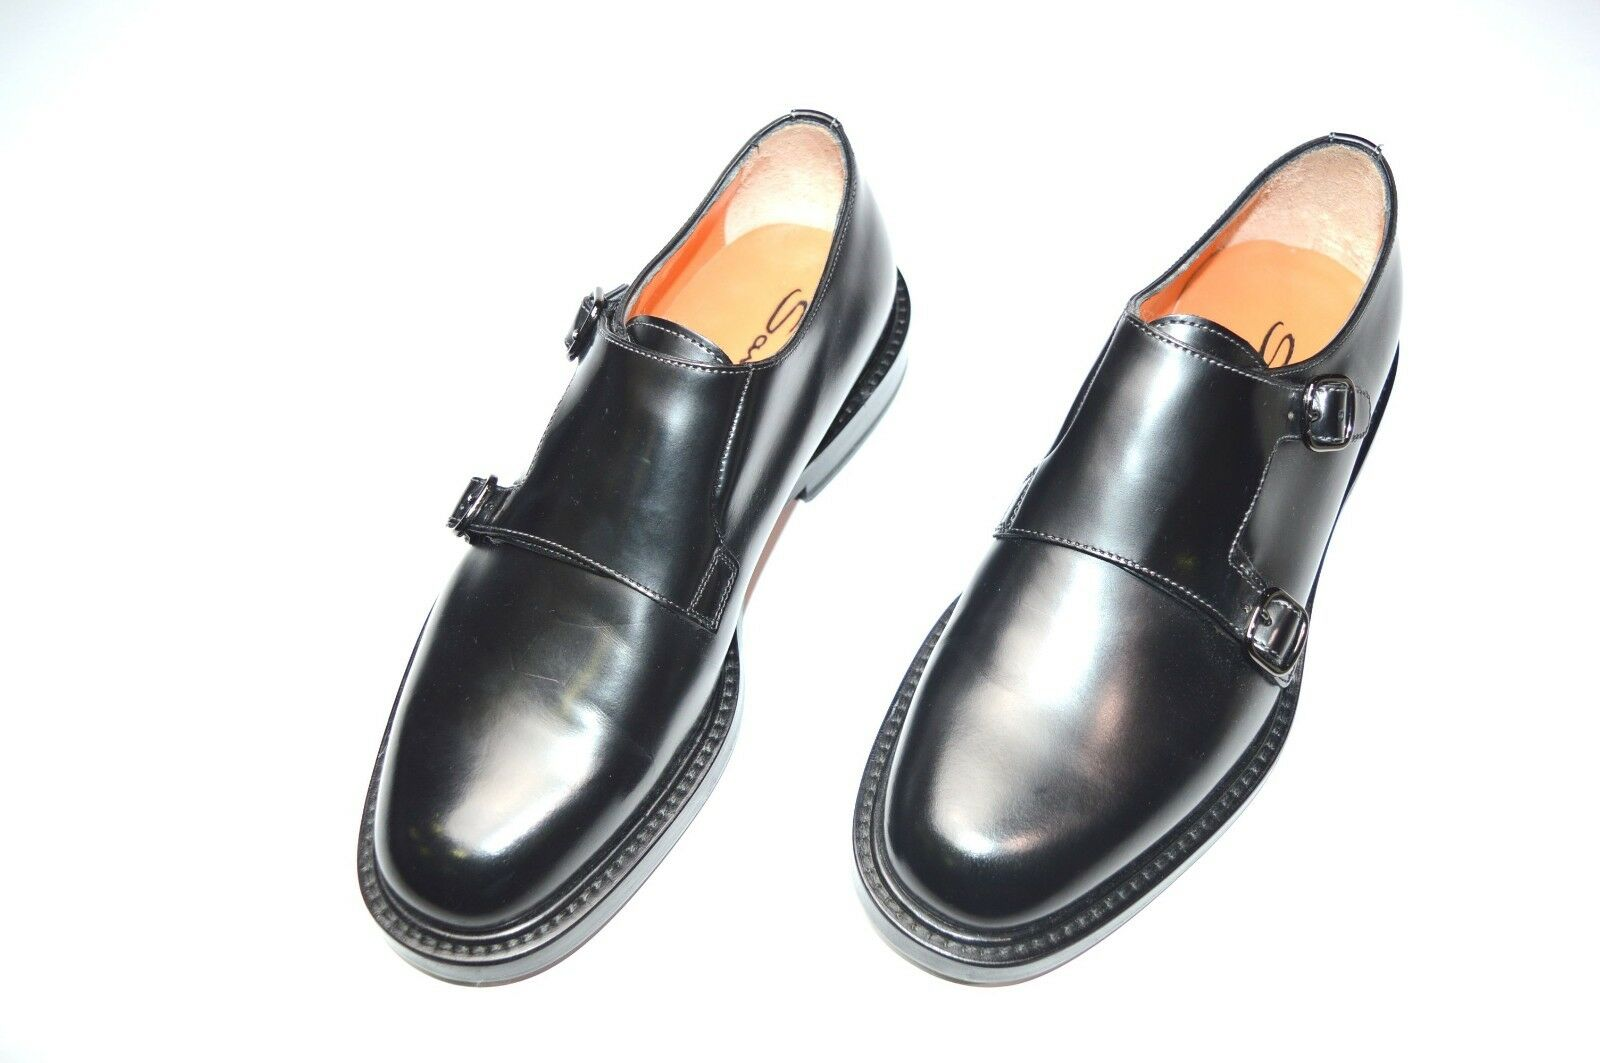 NEW SANTONI Dress Leather schuhe Monk Strap Größe Eu 42.5 Uk 8.5 Us 9.5 (R35)